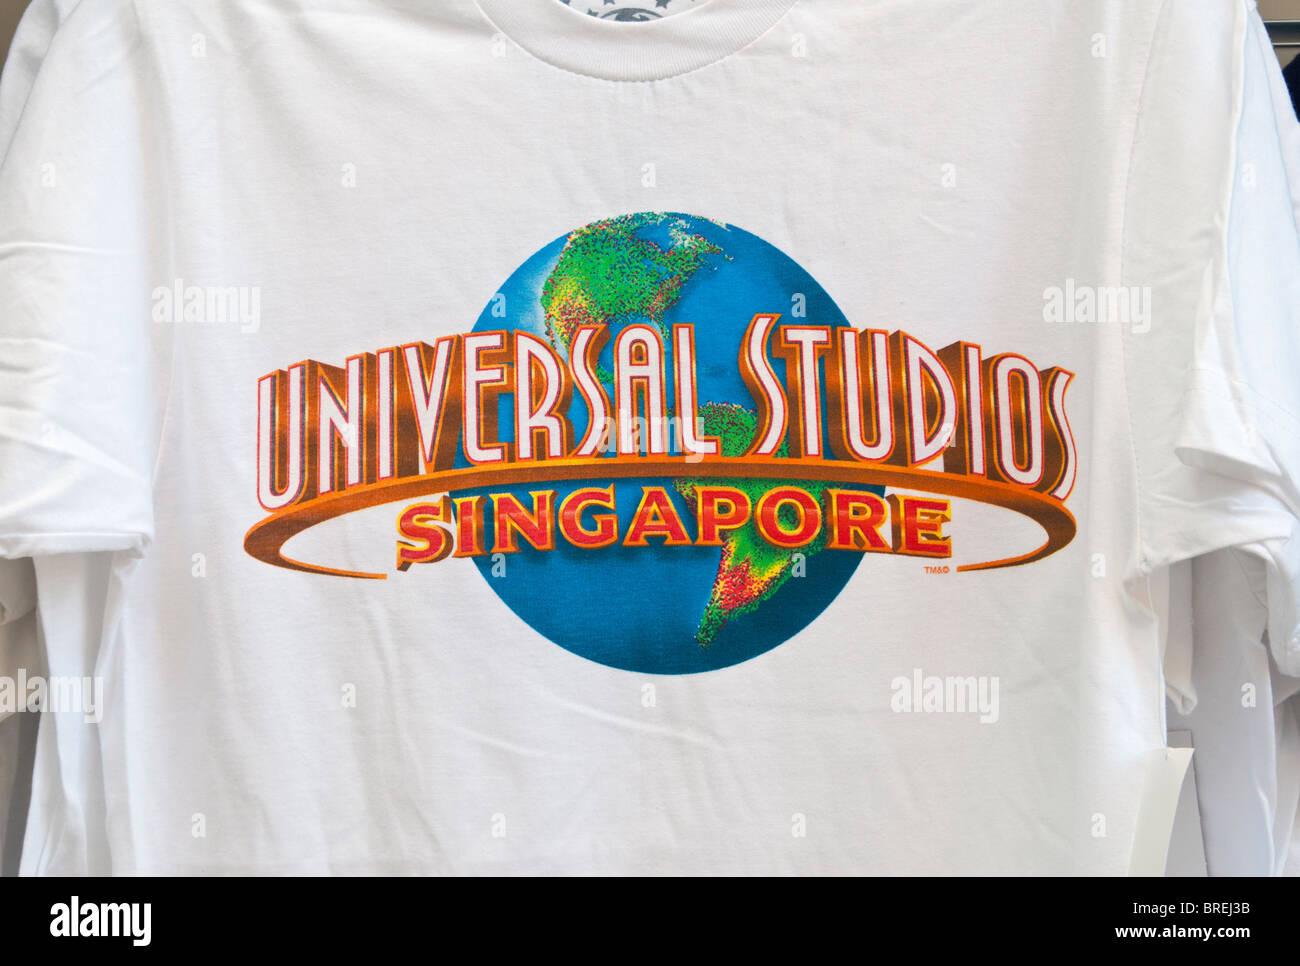 Universal Studios Singapore Logo On A White T Shirt At